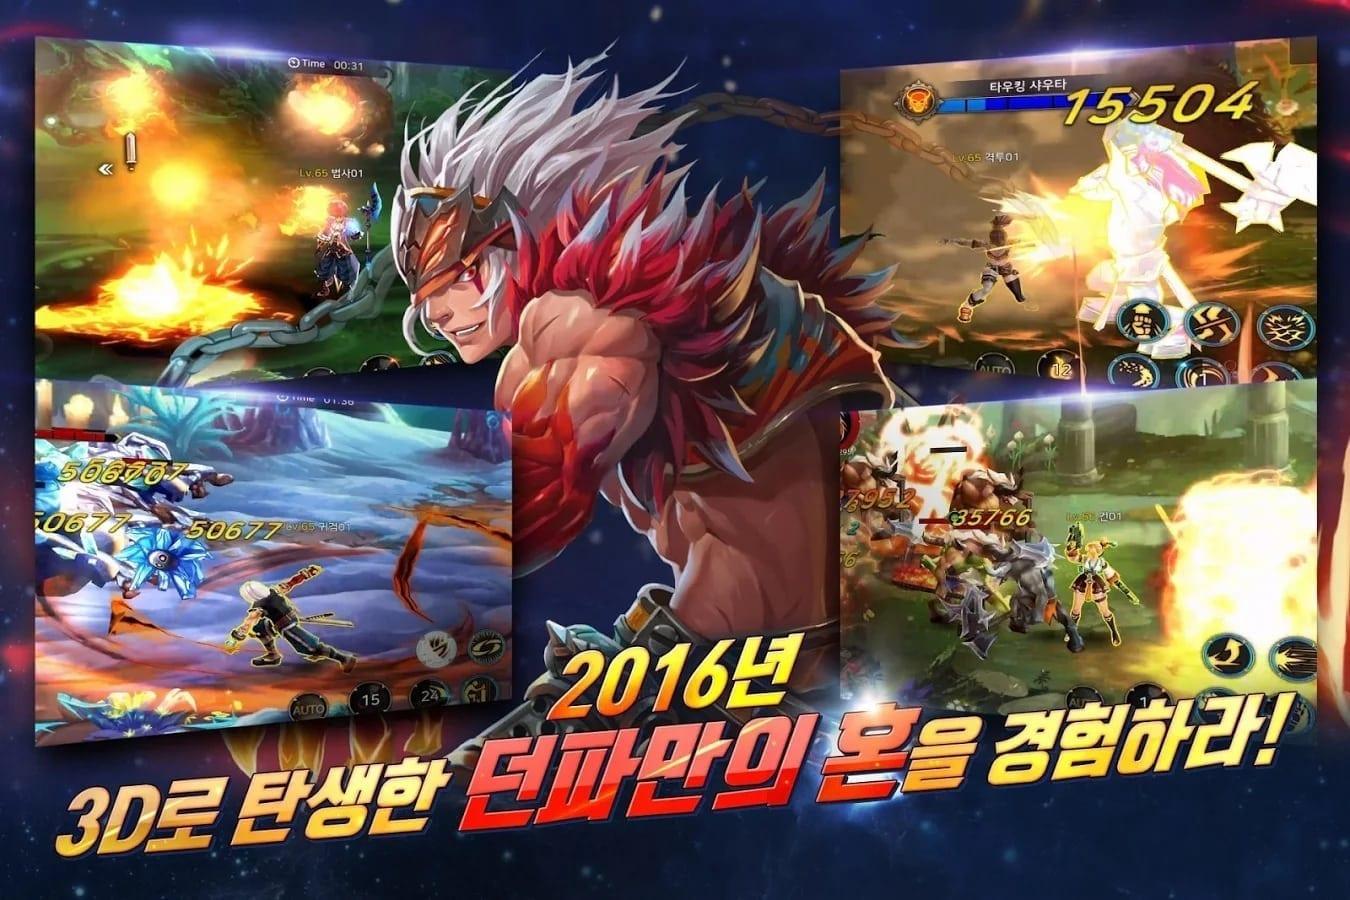 dungeon-fighter-spirit-google-play-image-1